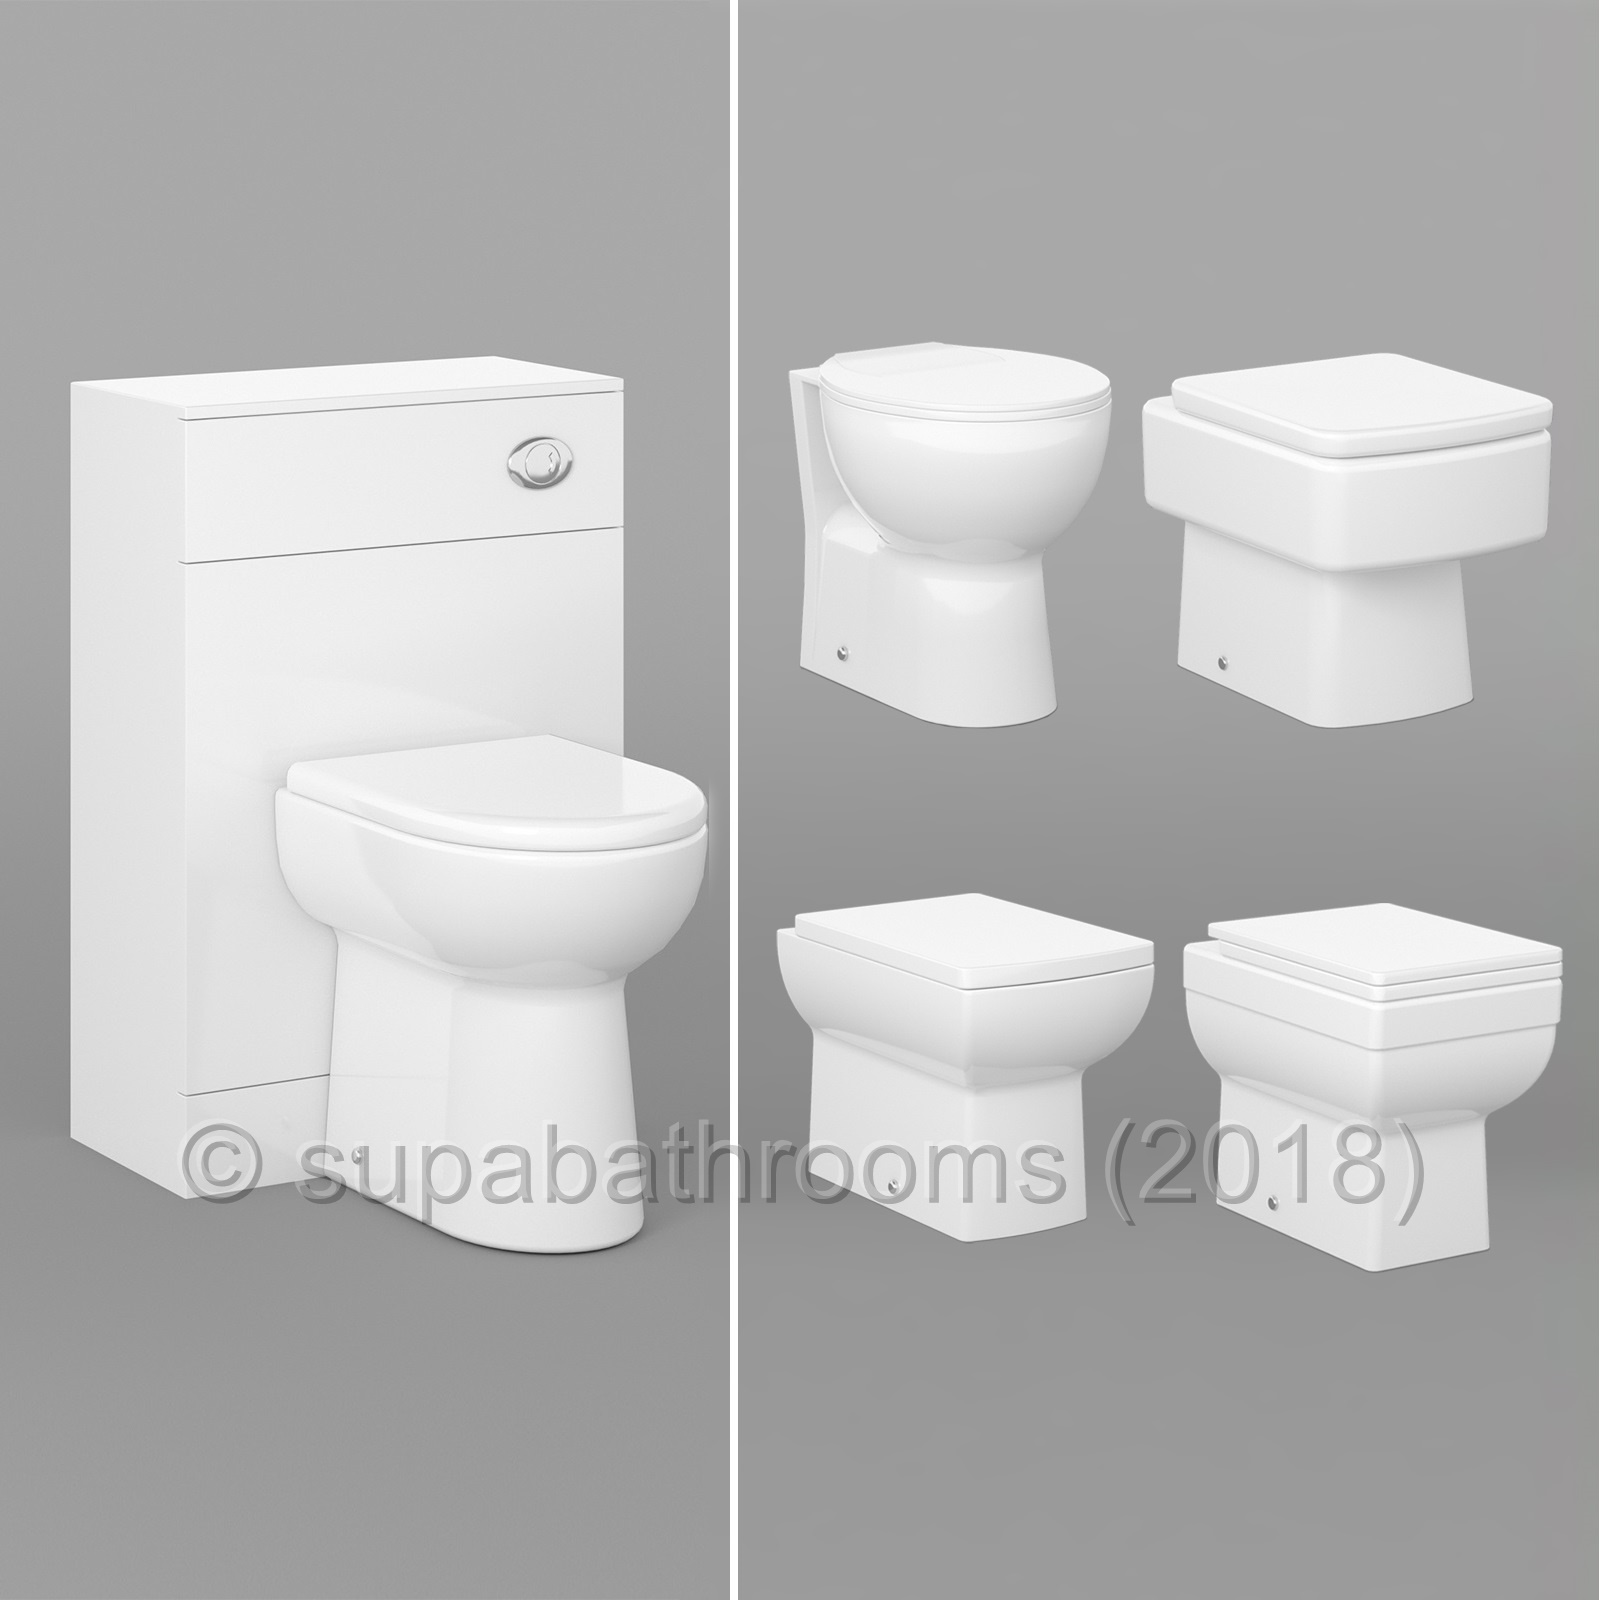 Bathroom Vanity Back to Wall Unit, WC Toilet Pan, Cistern & Seat ...